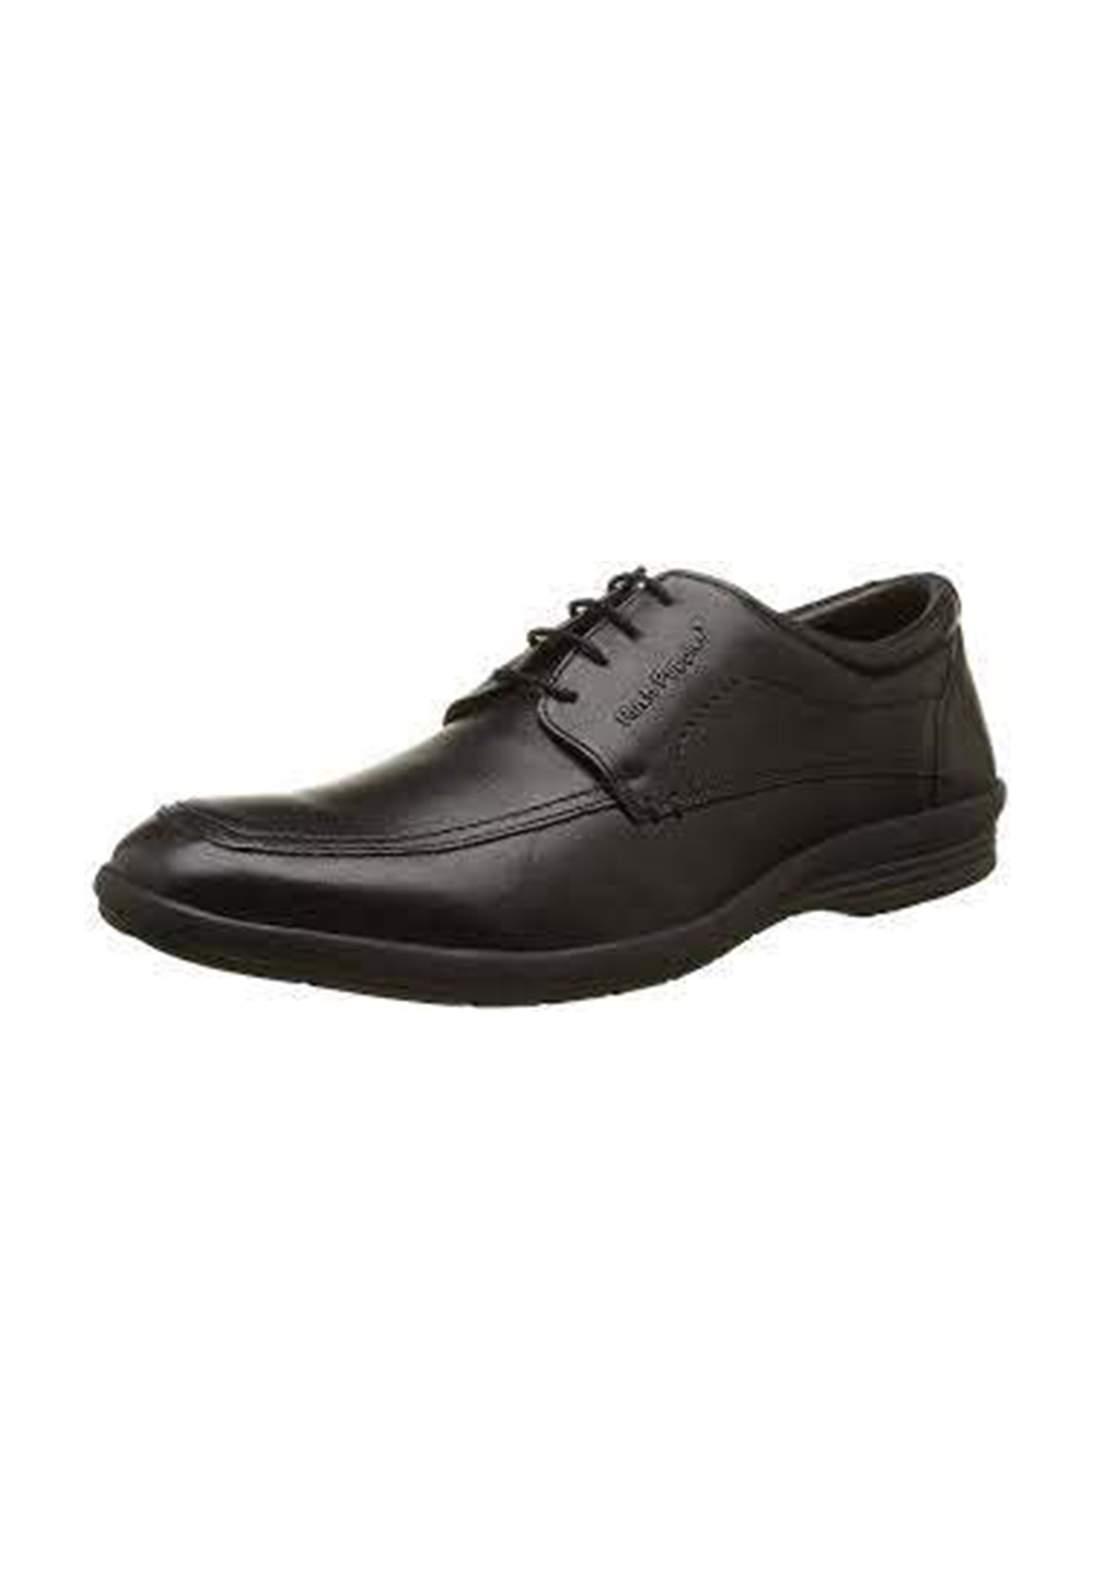 حذاء رجالي رسمي جلد لون اسود